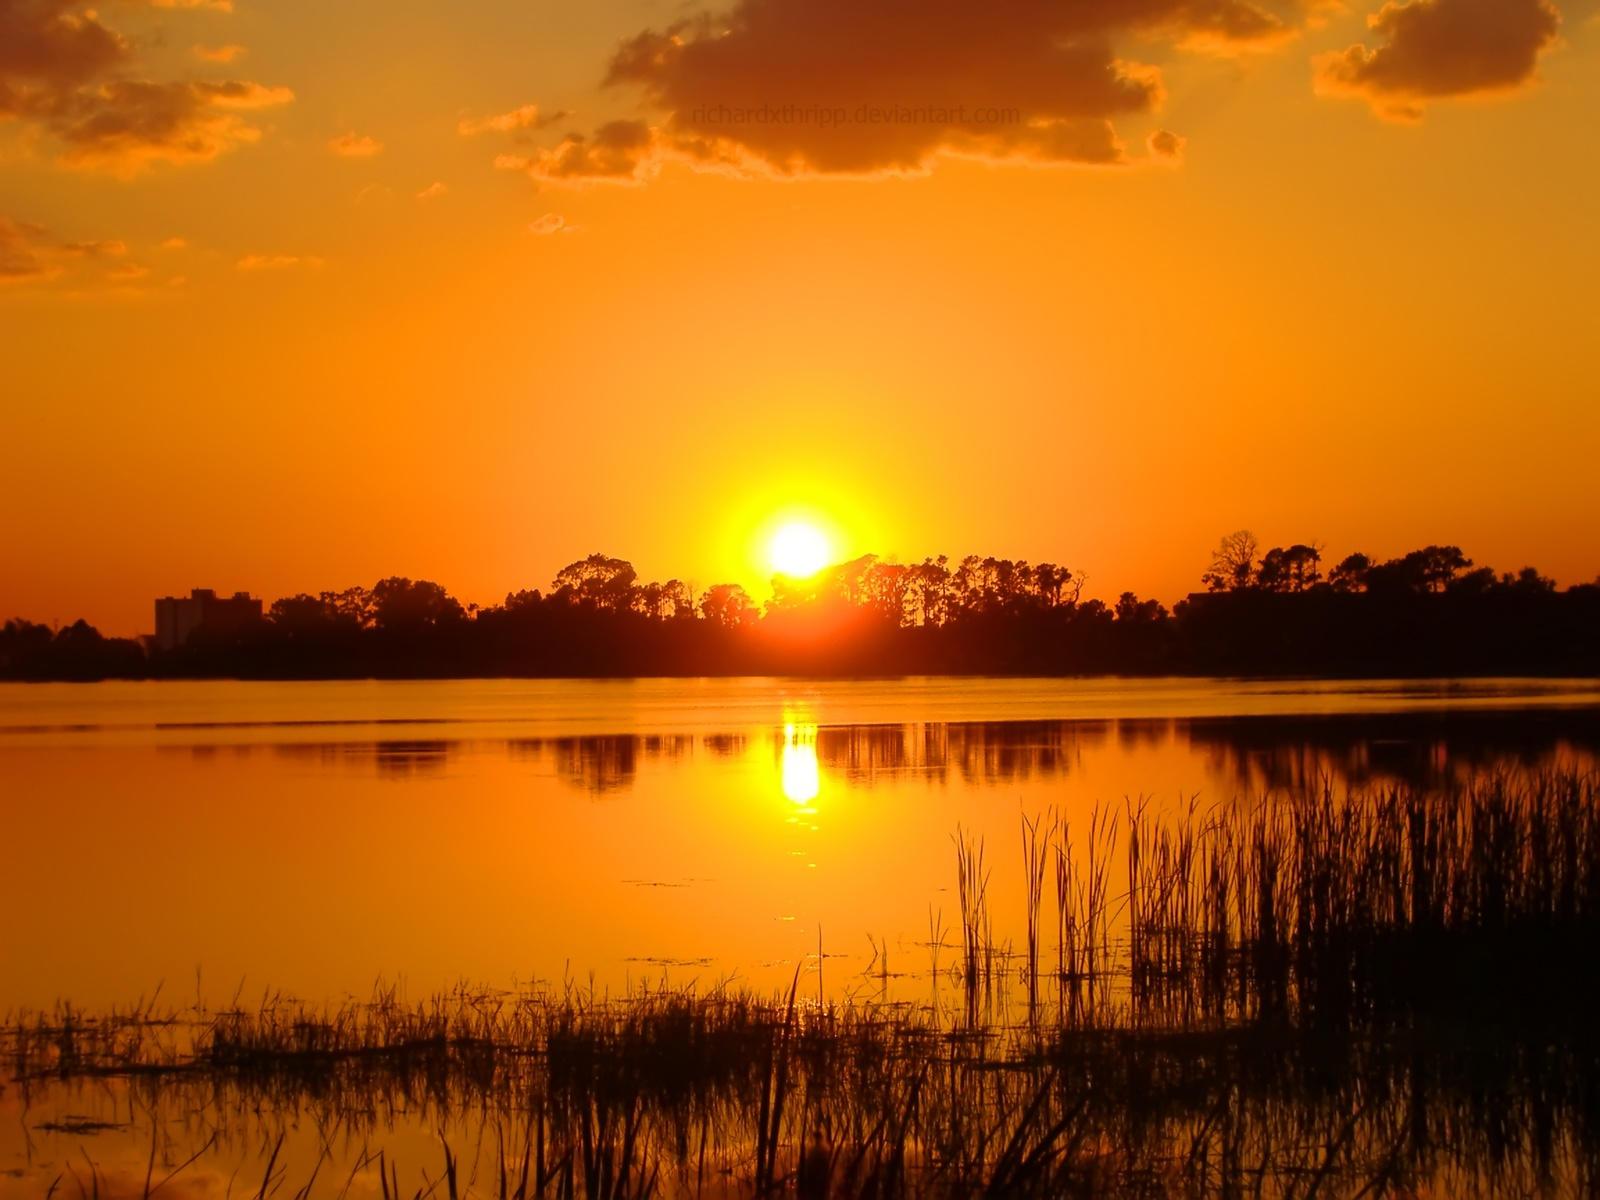 Fiery Orange Sunset Wallpaper by richardxthripp